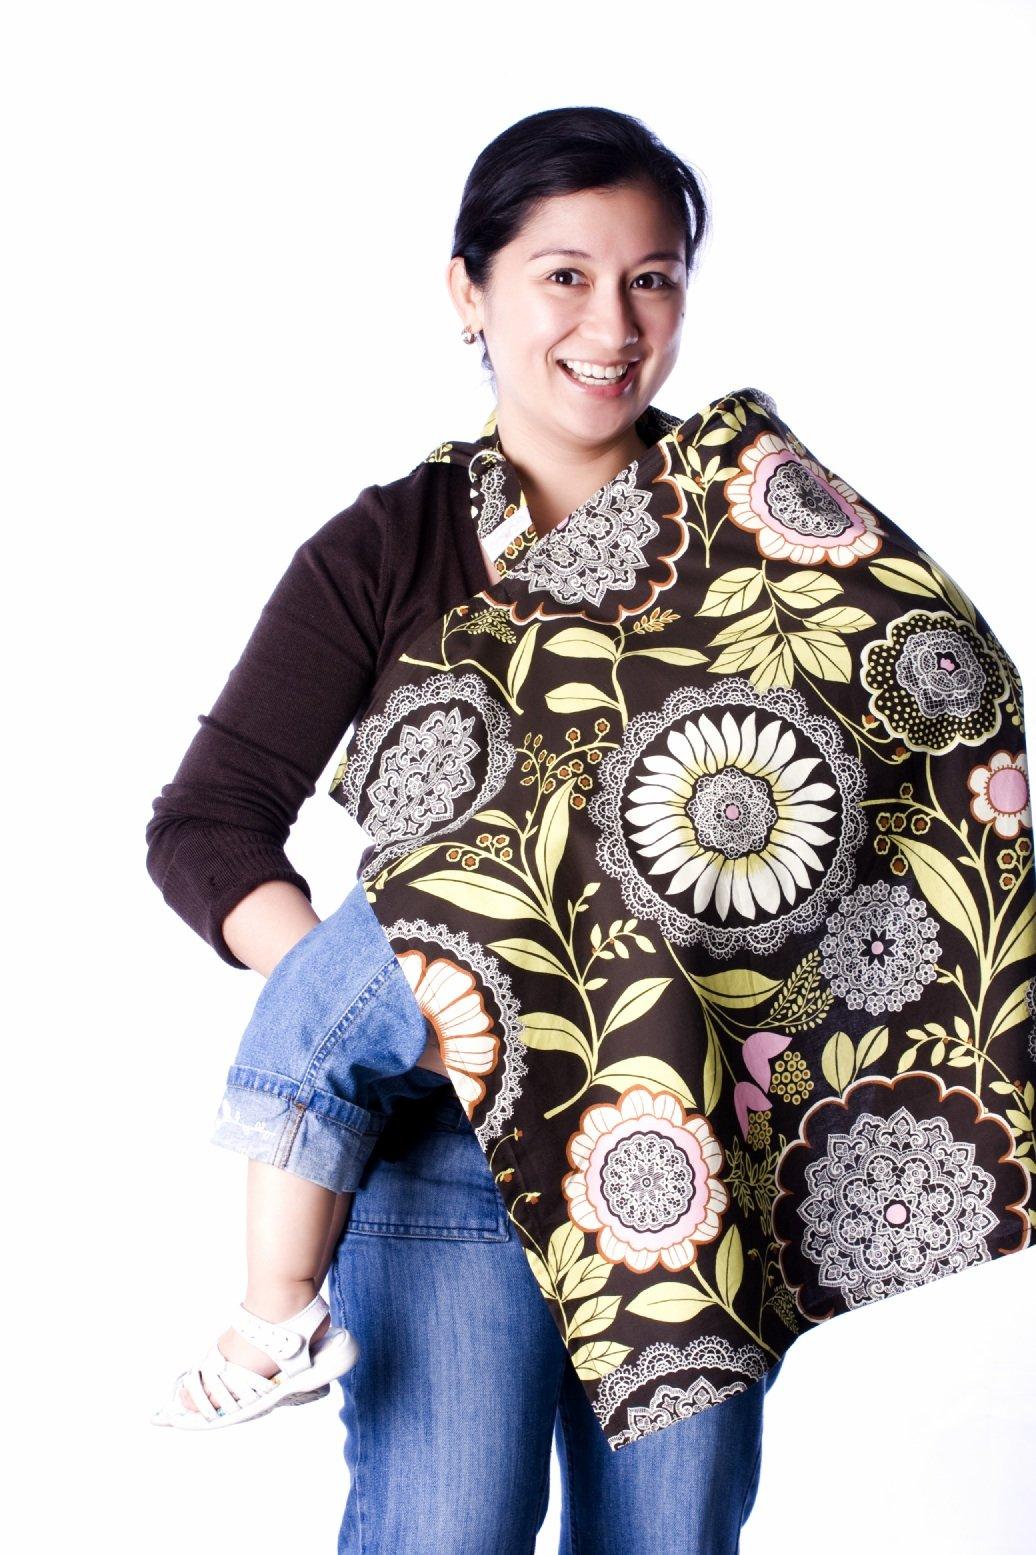 Win a Fabulous Nursing Cover from Nursingmom!